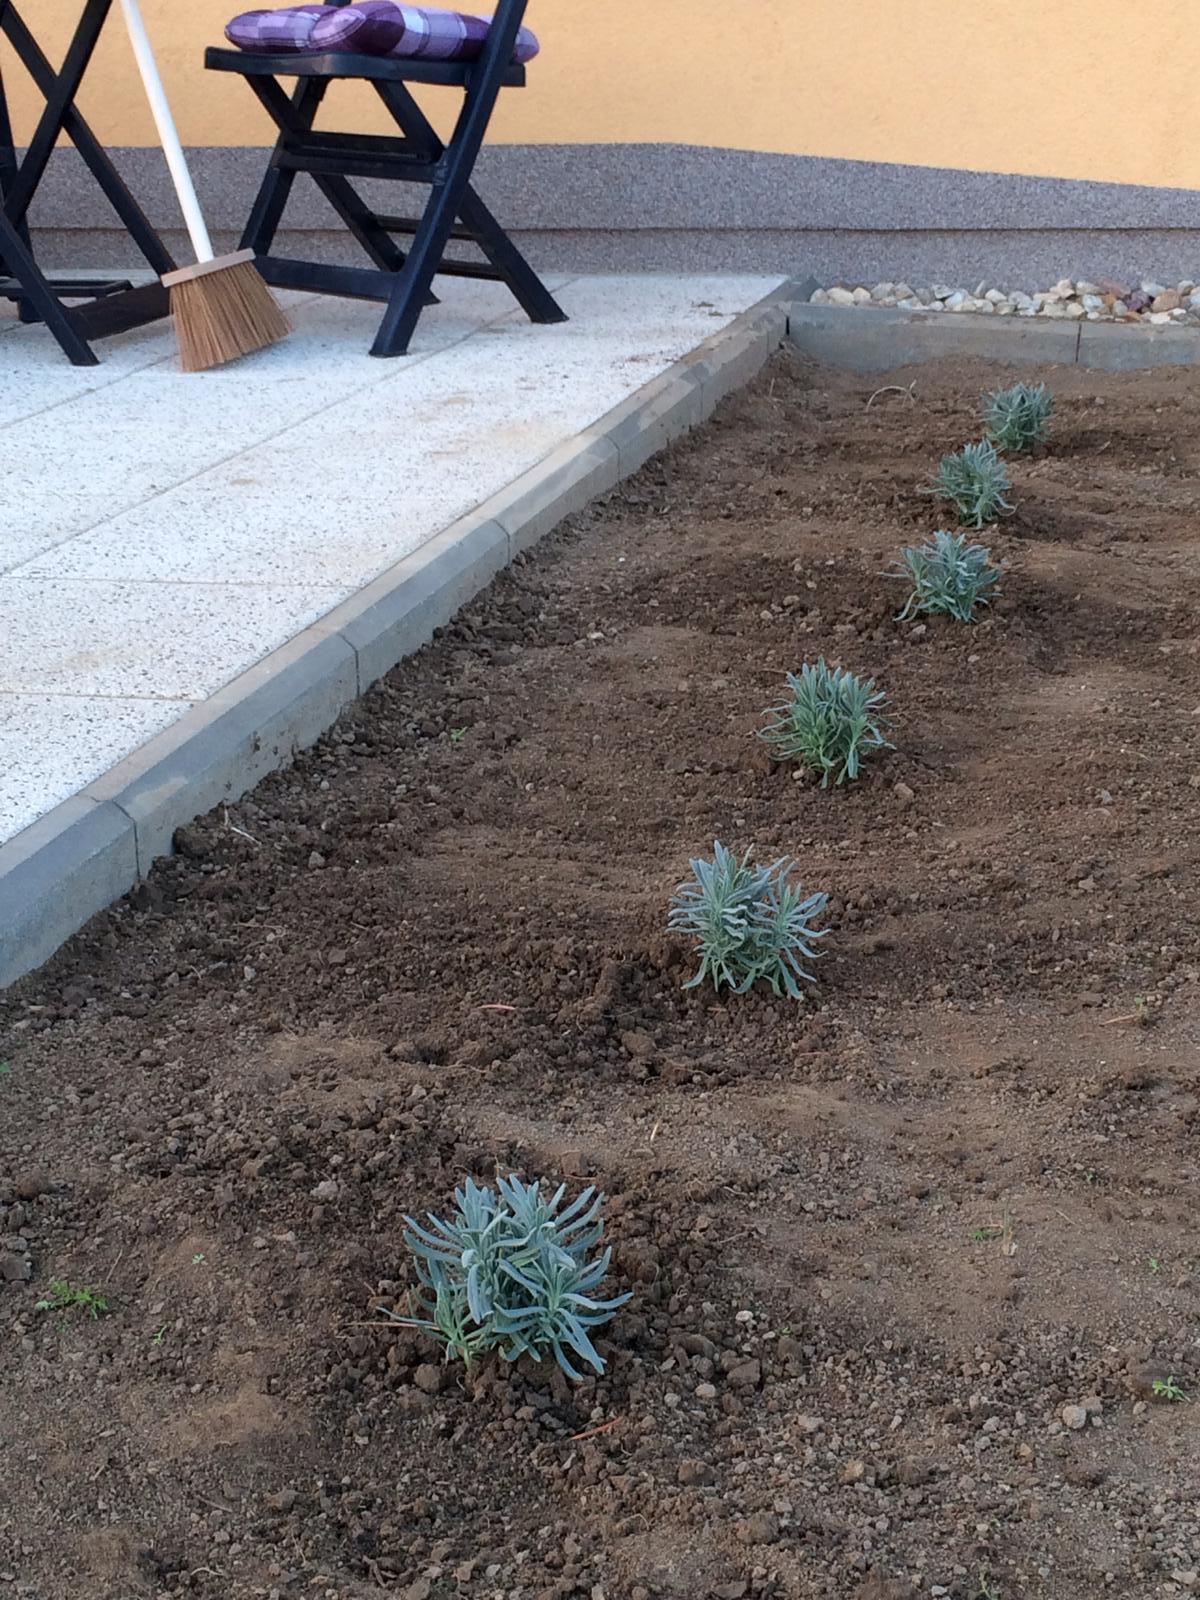 Zahrada- jak to vsechno zacalo.. - A levandulky nasazene.. Jeste druha strana terasy :)